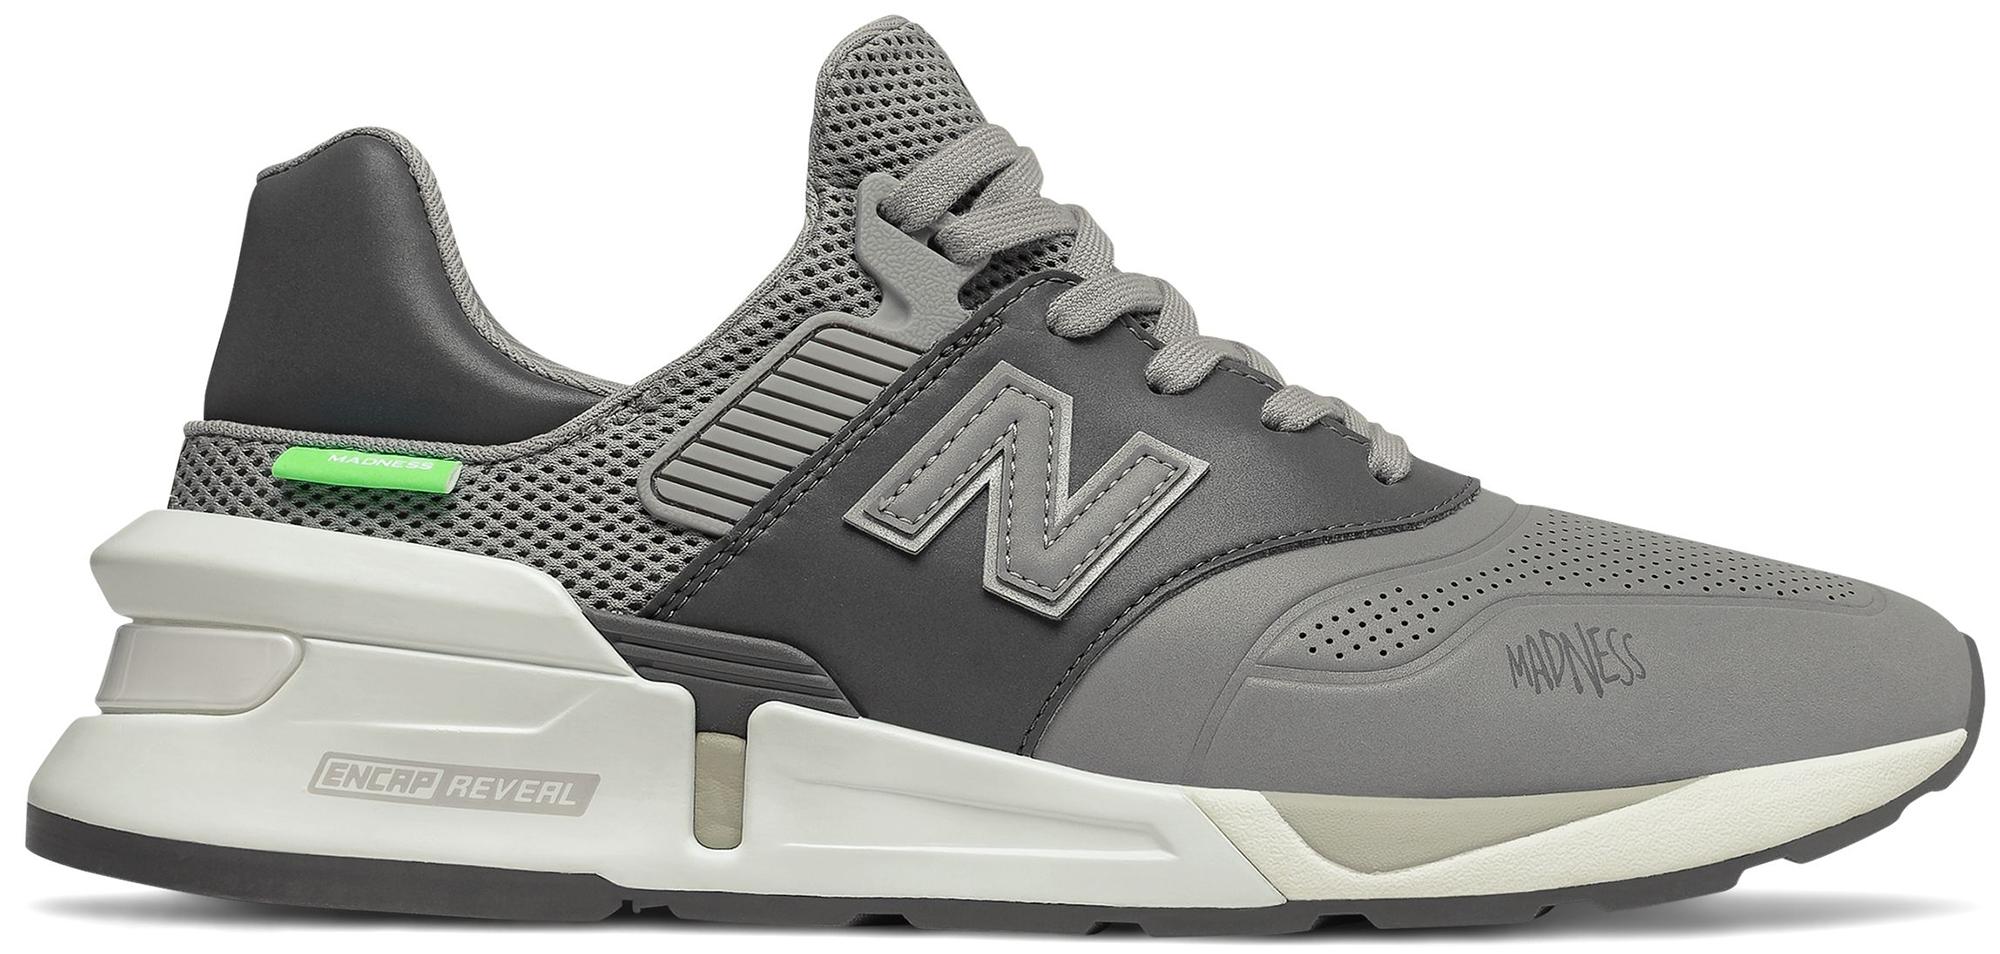 new balance 997s grey